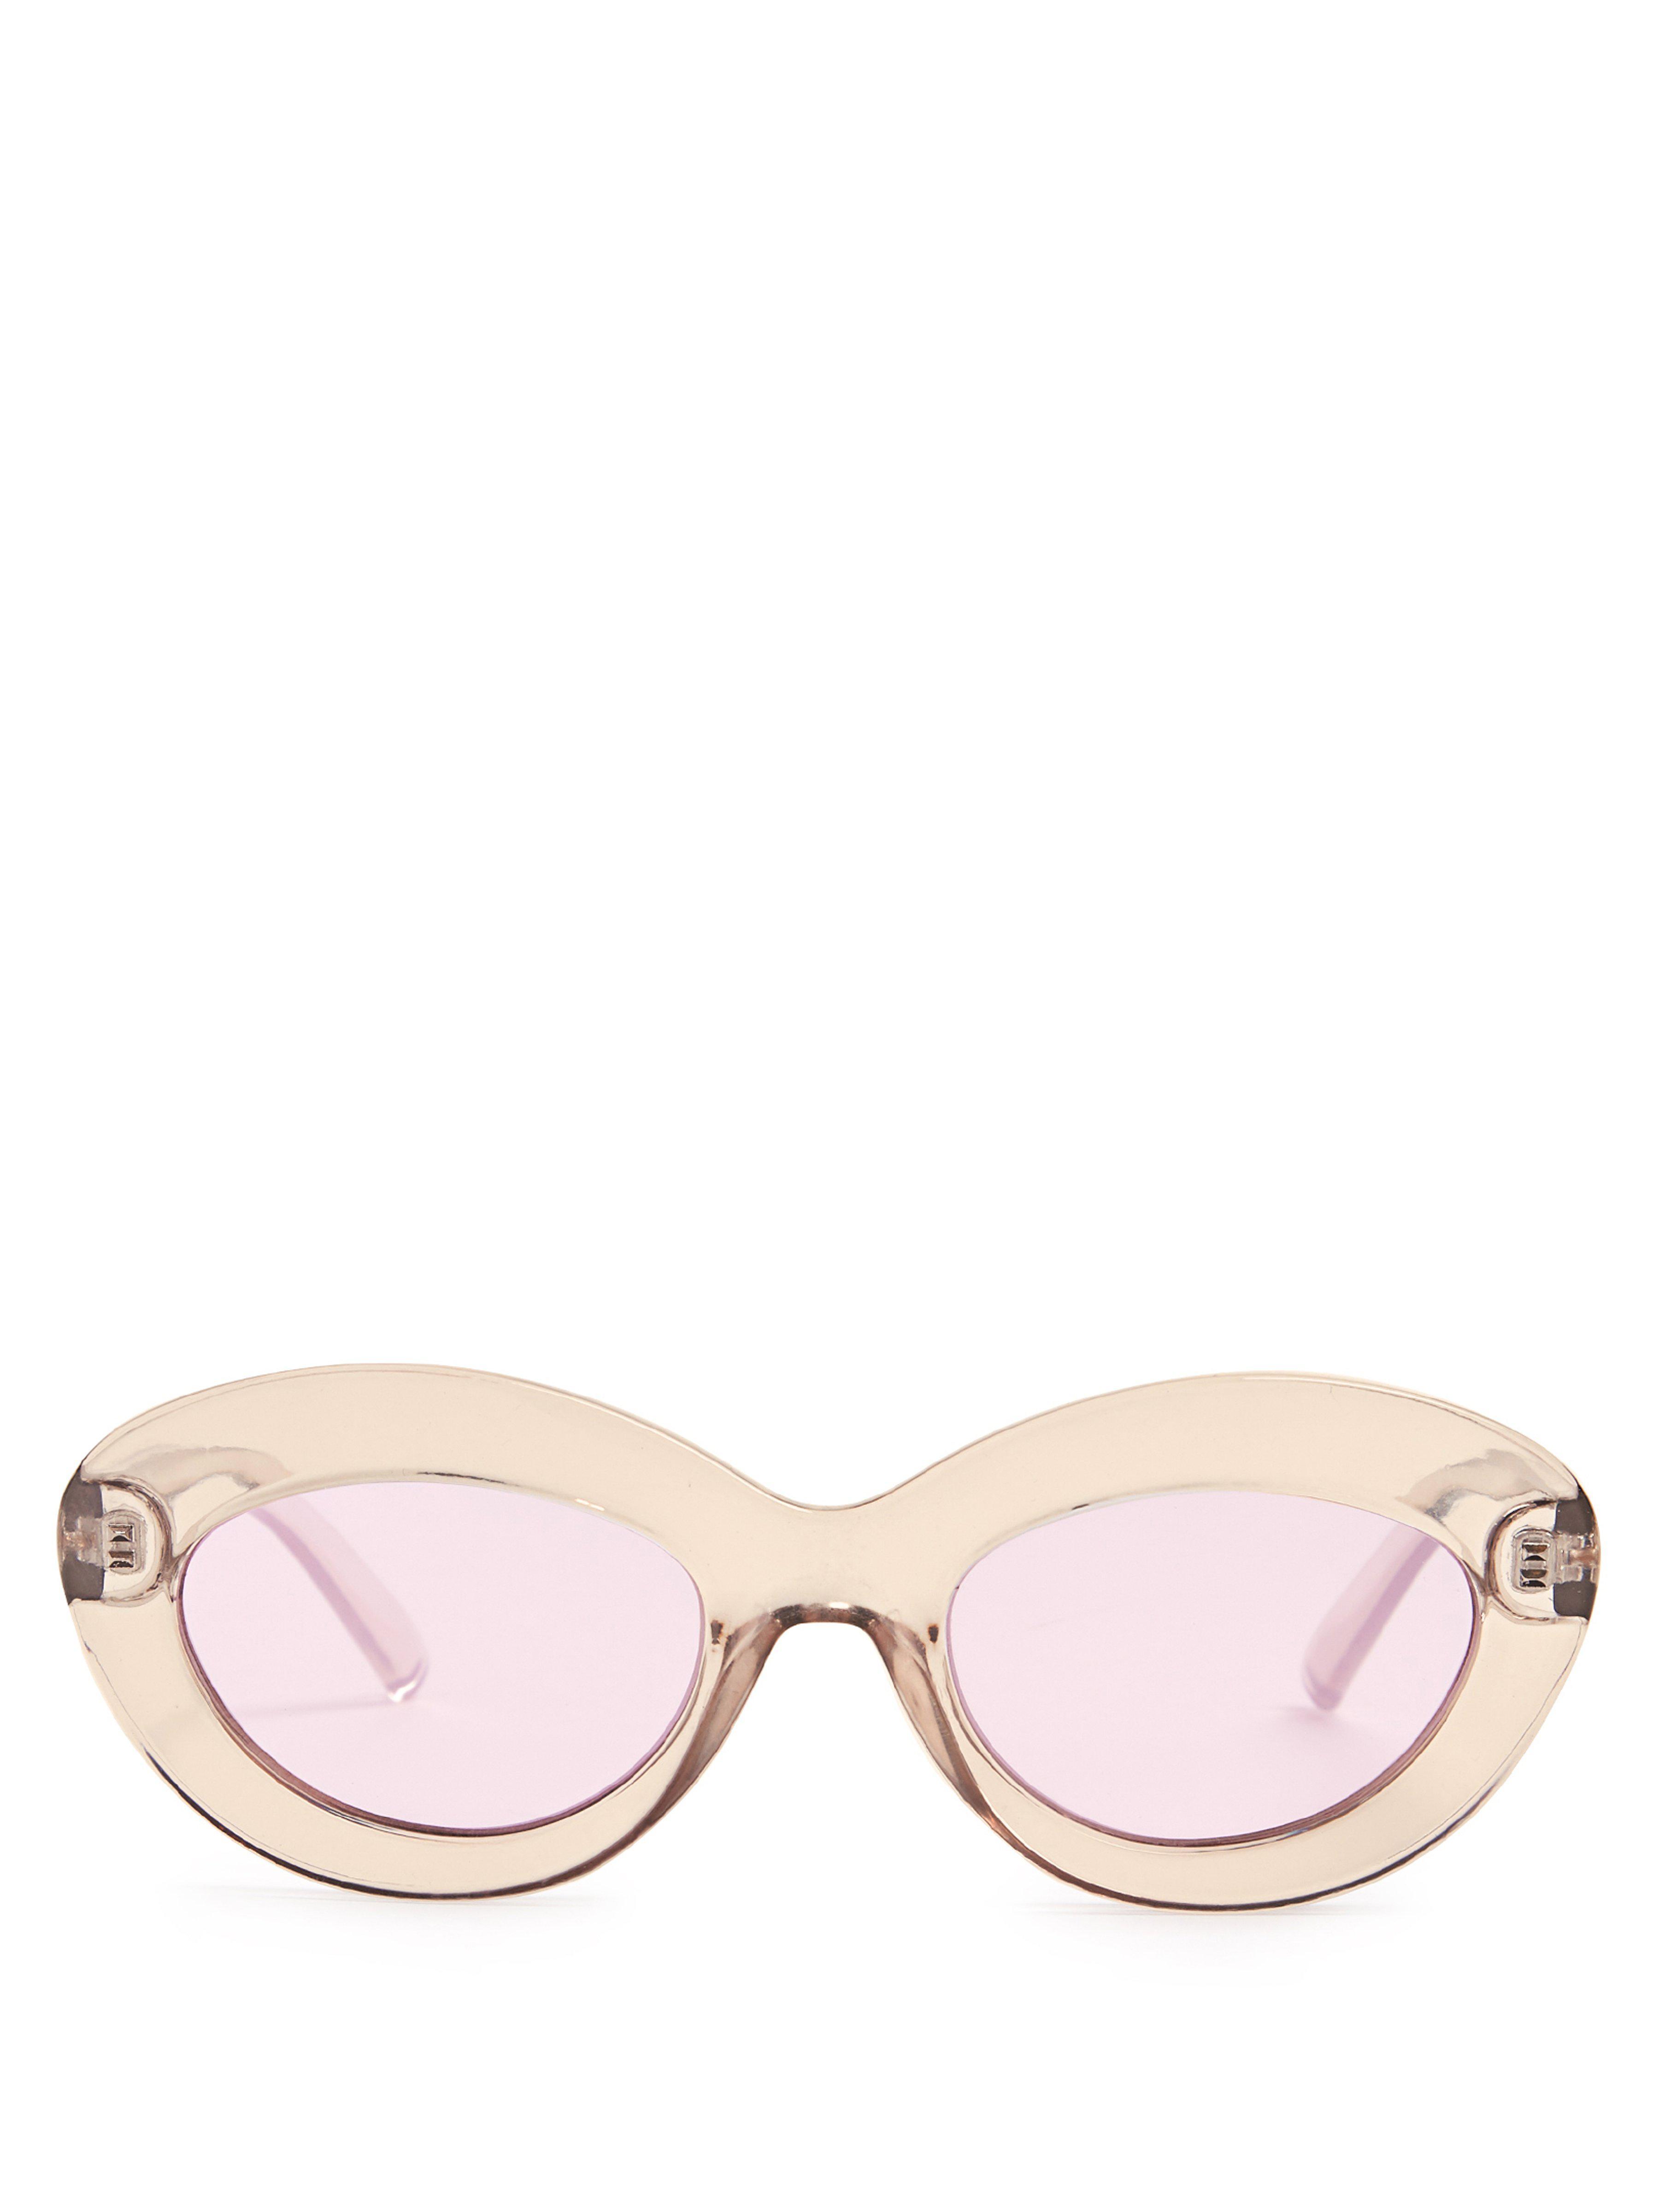 deda8492514 Le Specs Fluxus Oval Cat Eye Acetate Sunglasses - Lyst